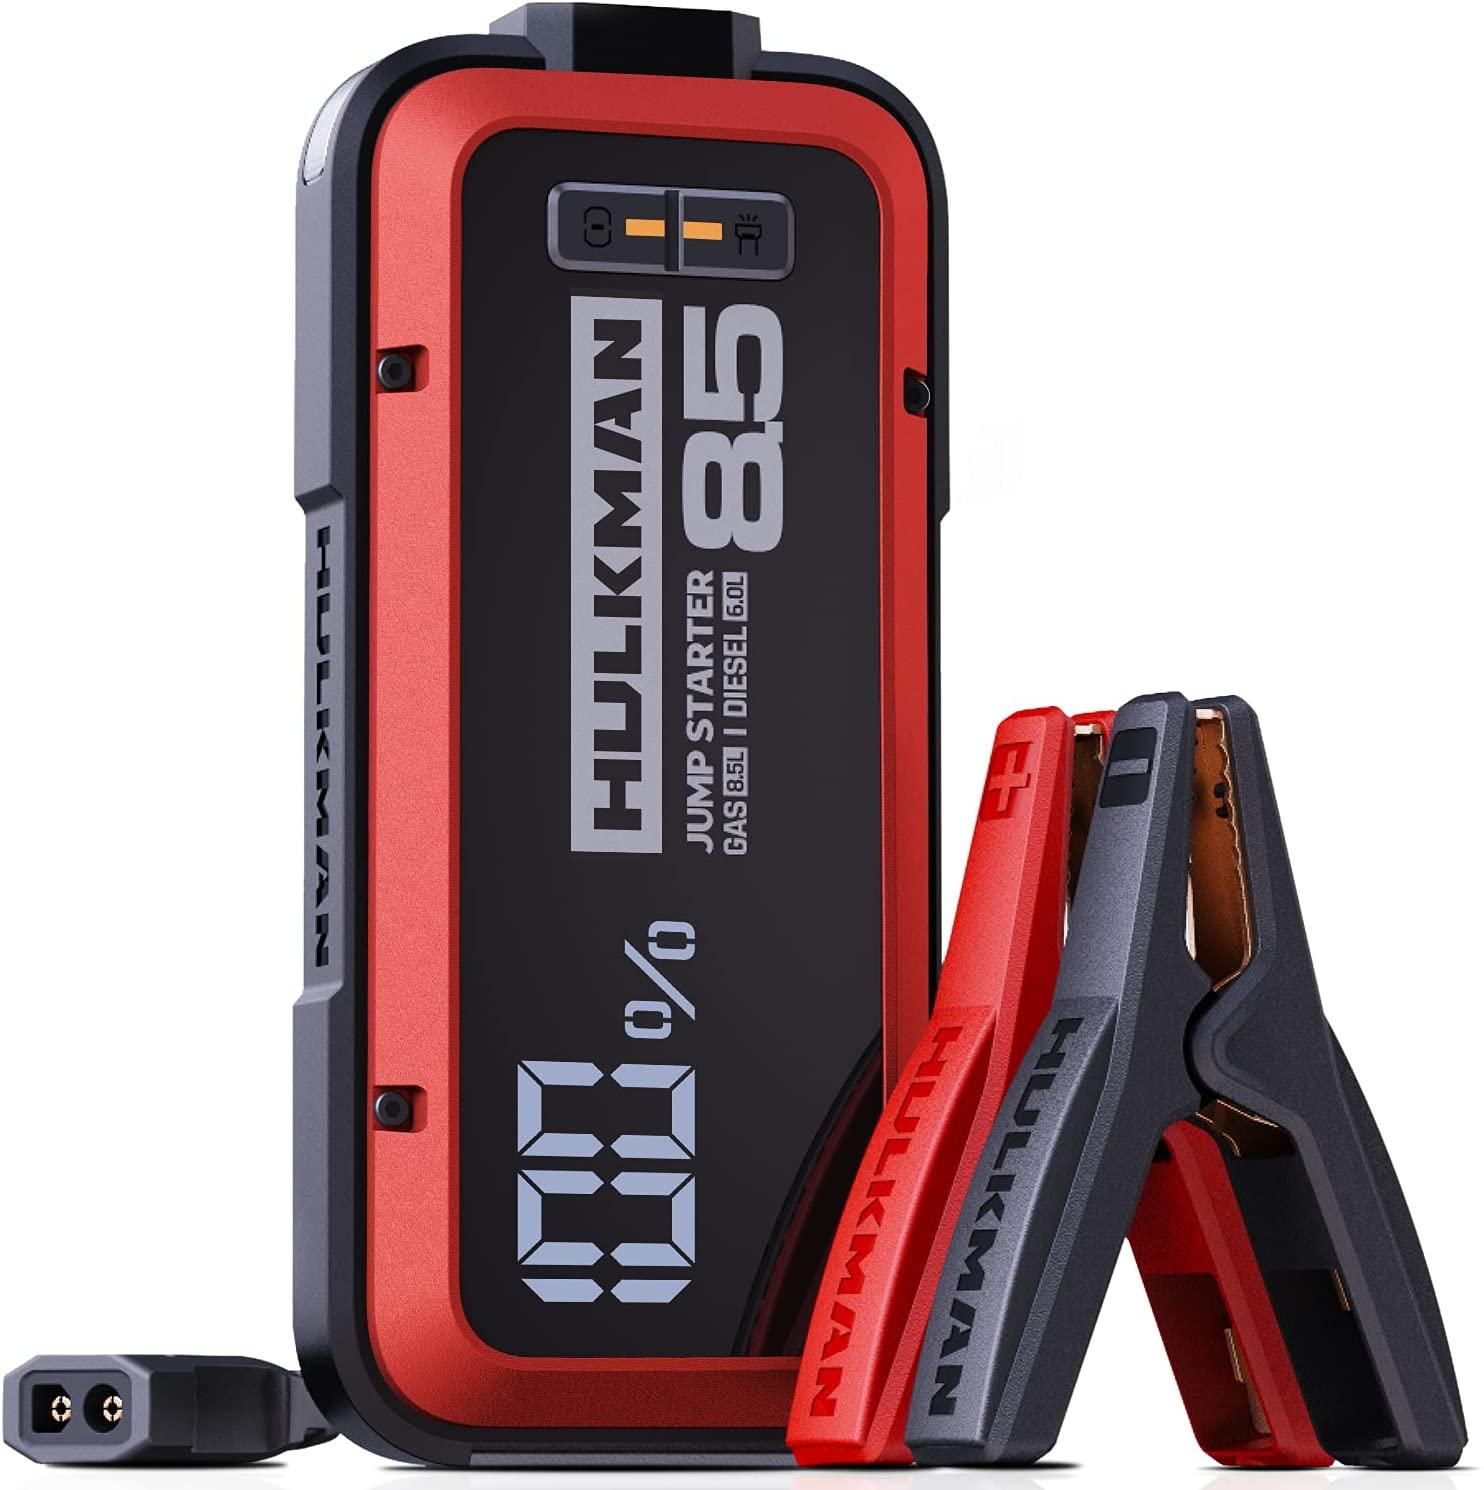 5 Best Portable Car Battery Jump Starters (2021 Comparison) - HULKMAN